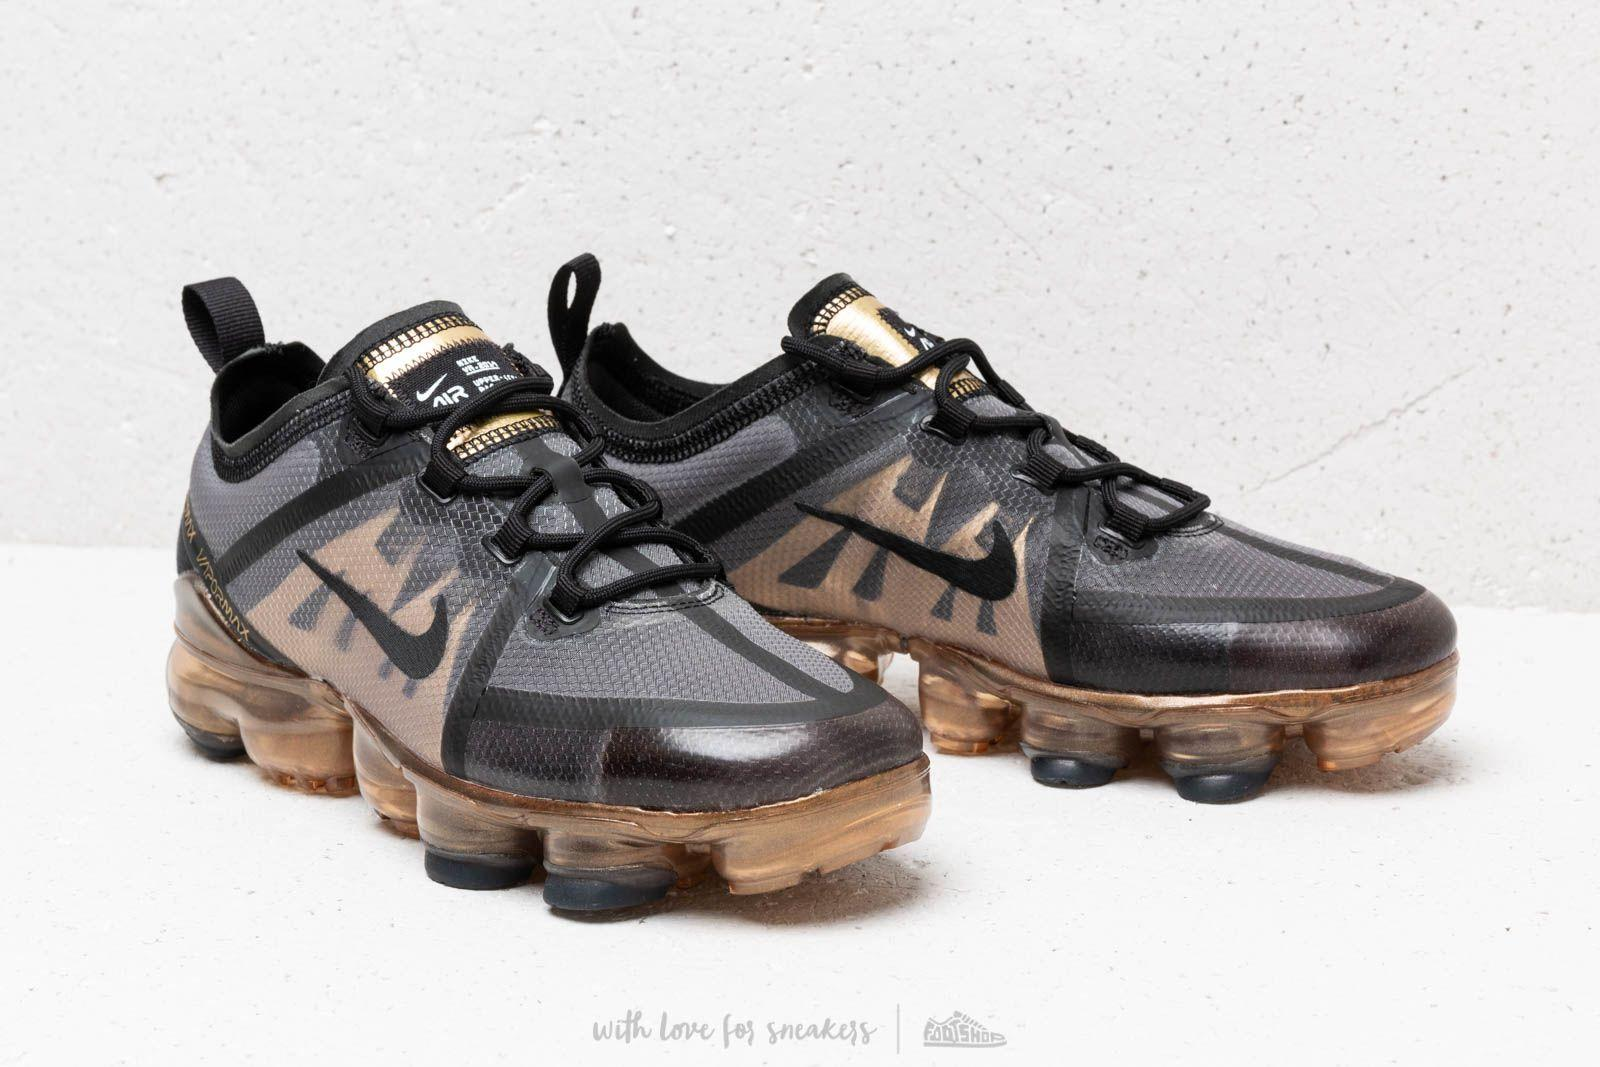 f579ec946d15 Lyst - Nike Air Vapormax 2019 (gs) Black  Black-metallic Gold in ...